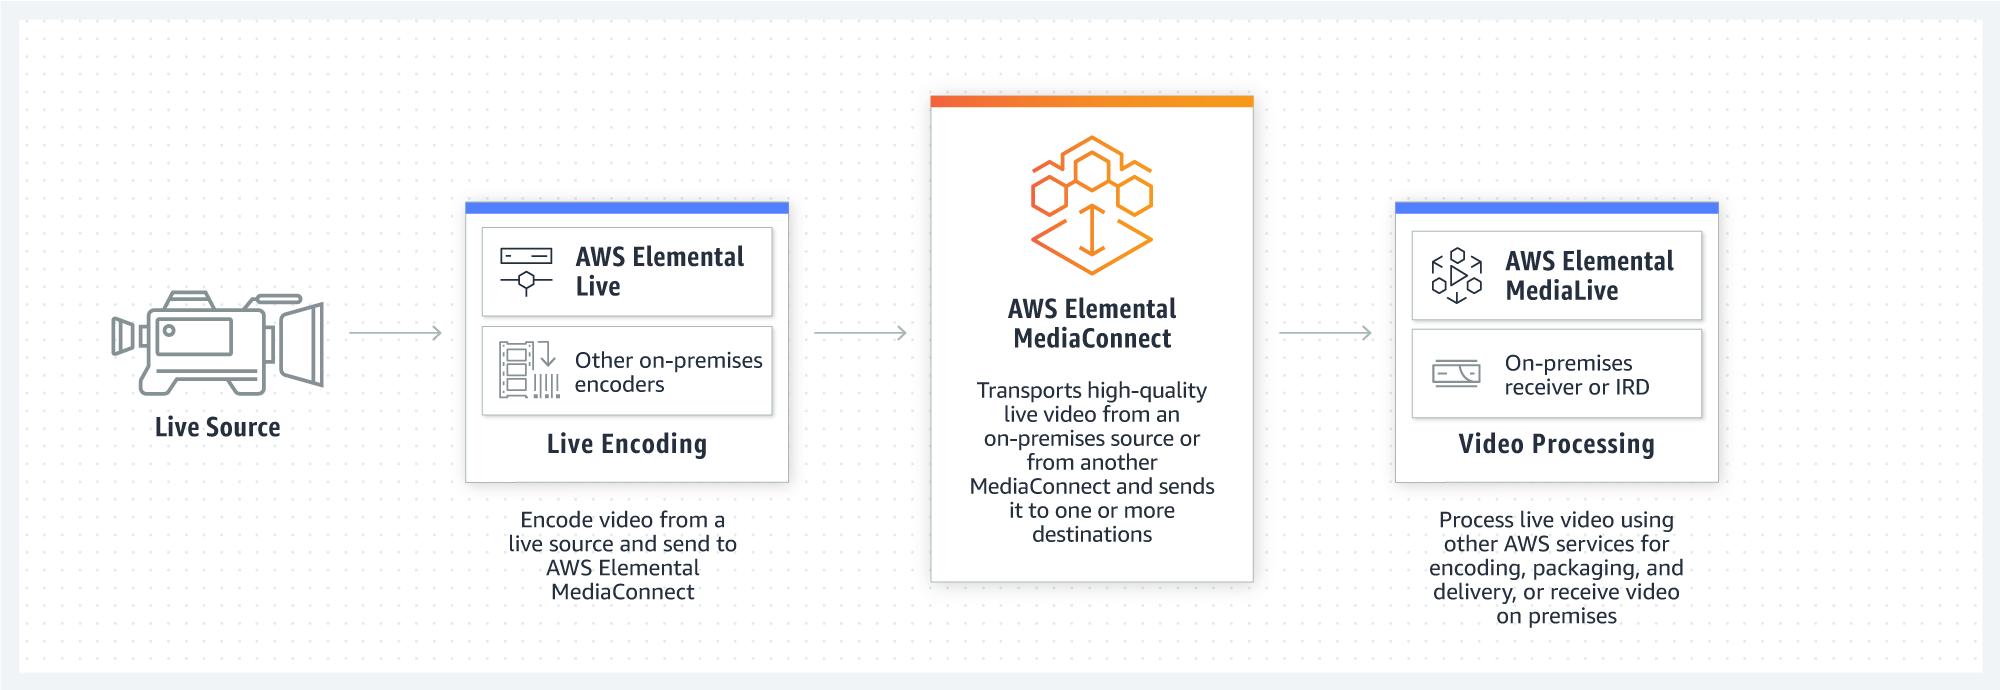 aws-mediaconnect